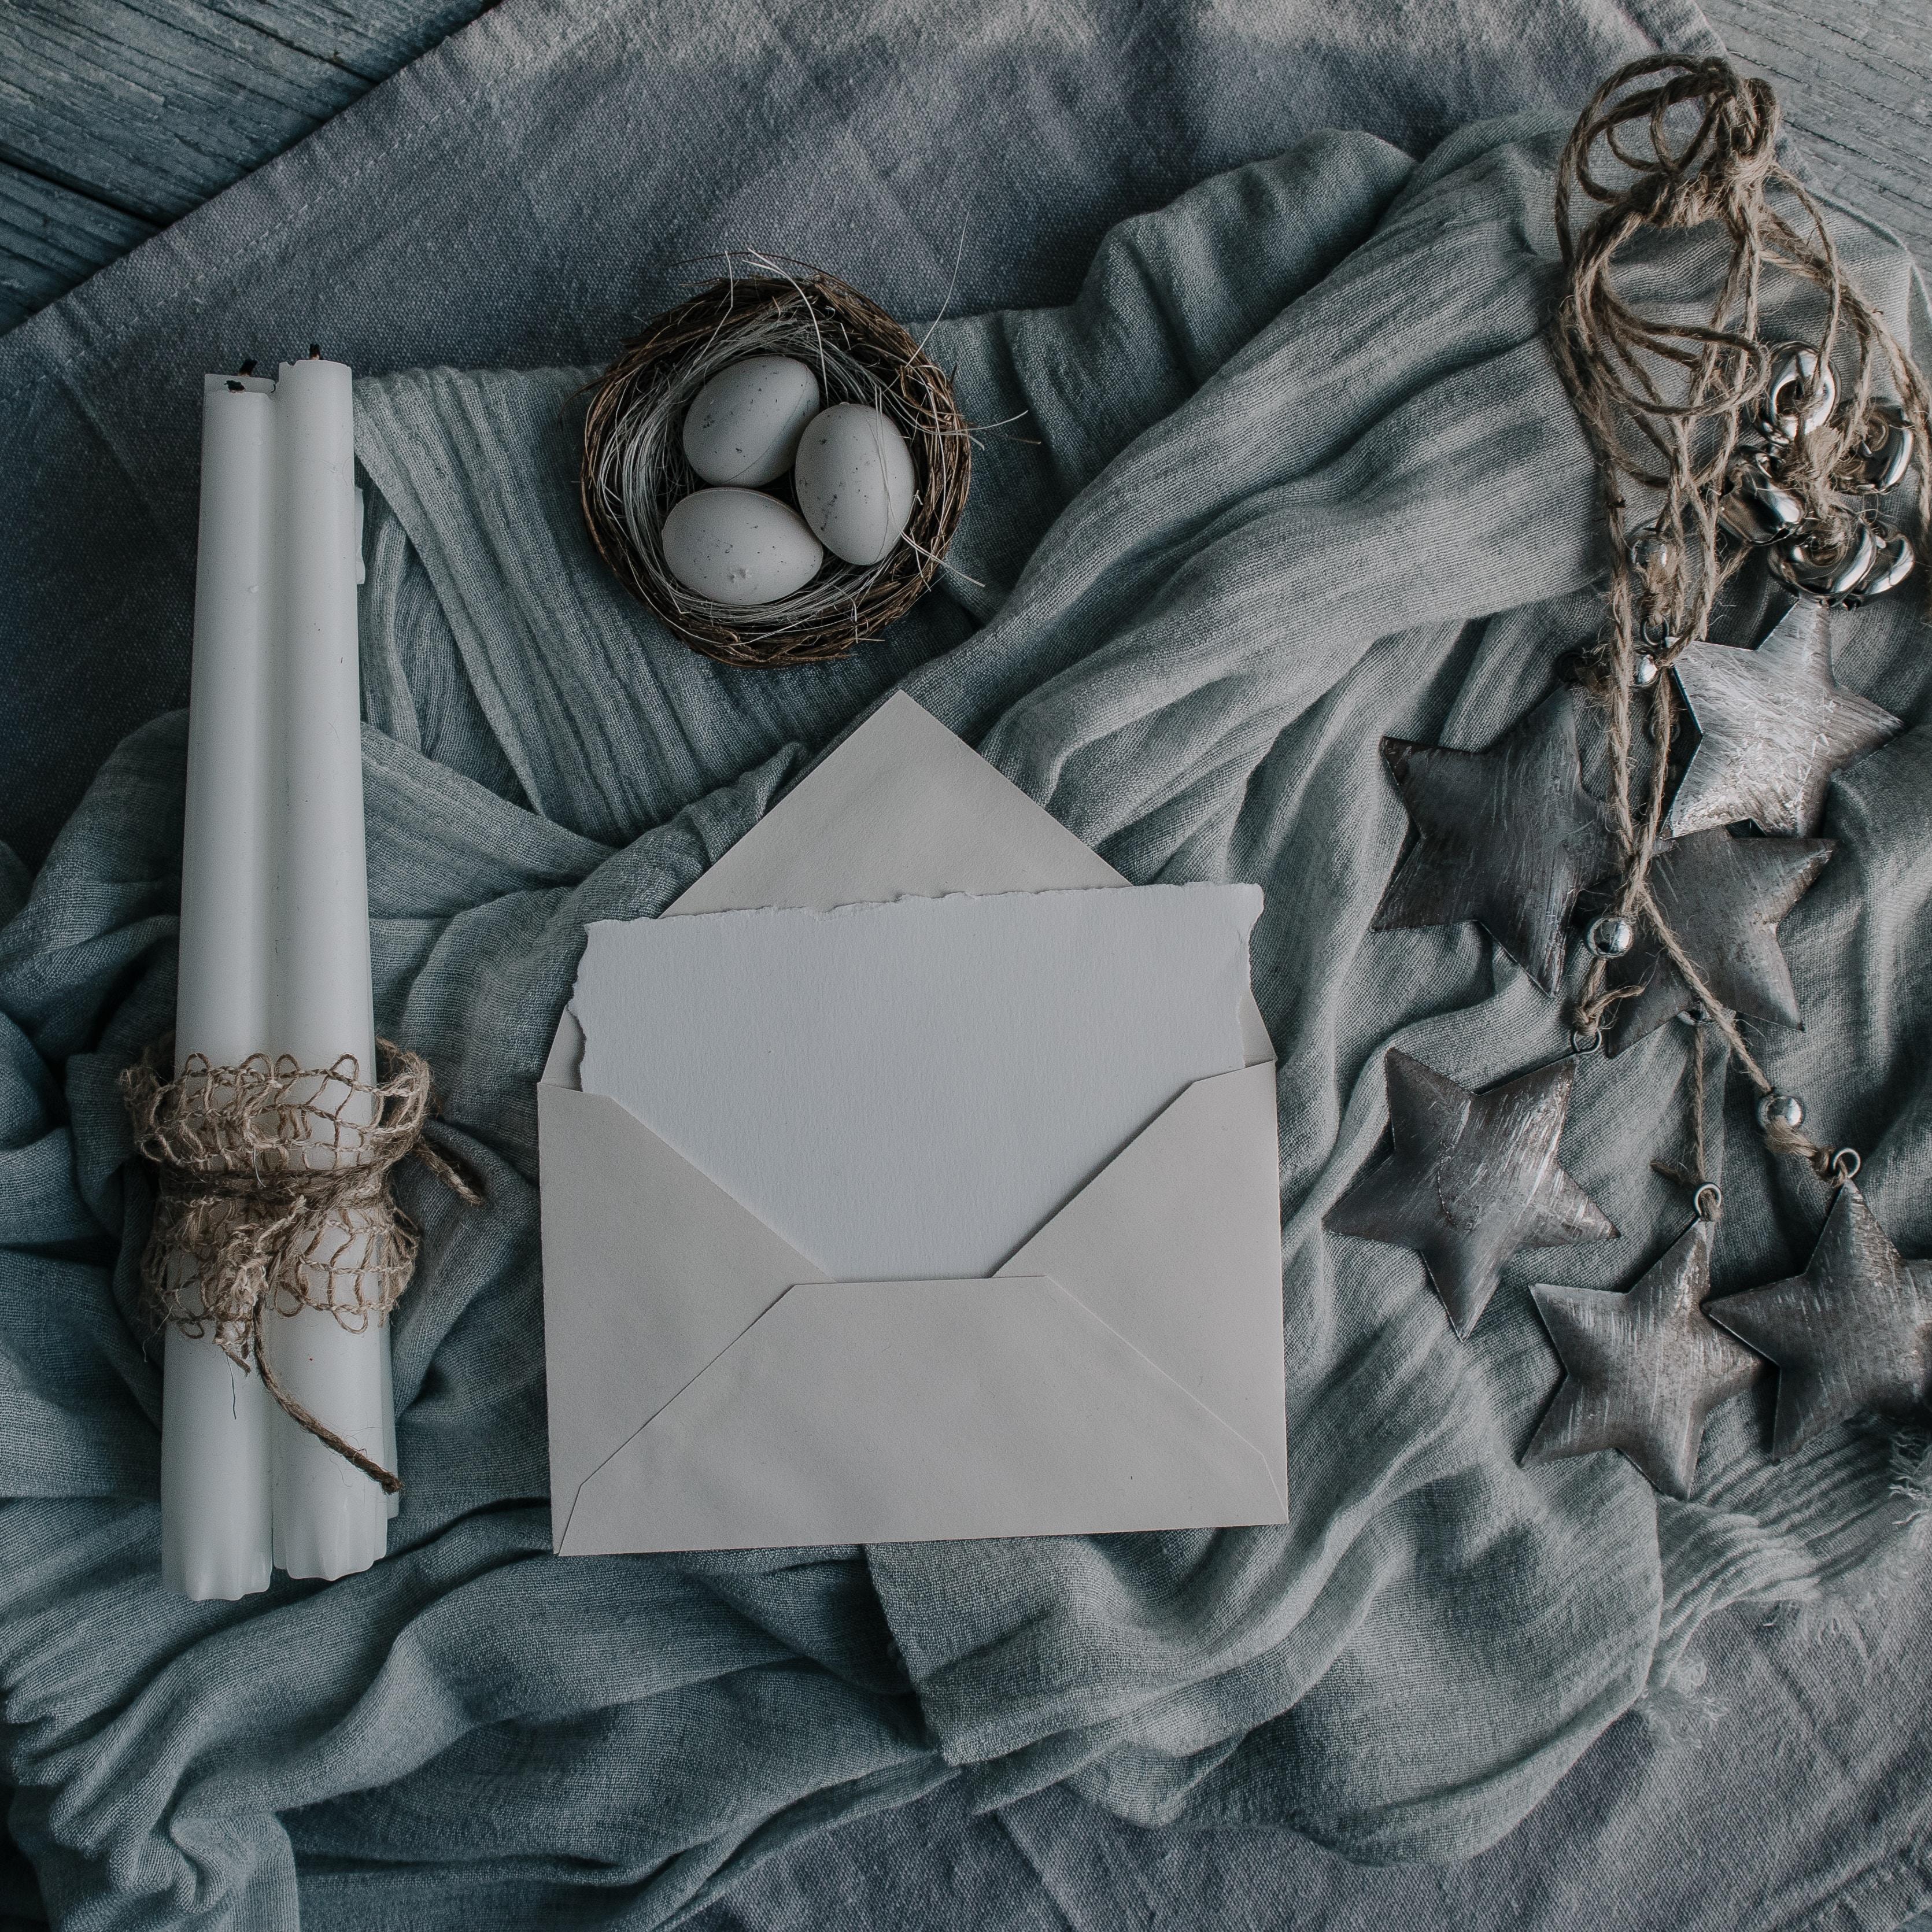 white envelop nearby white candle sticks